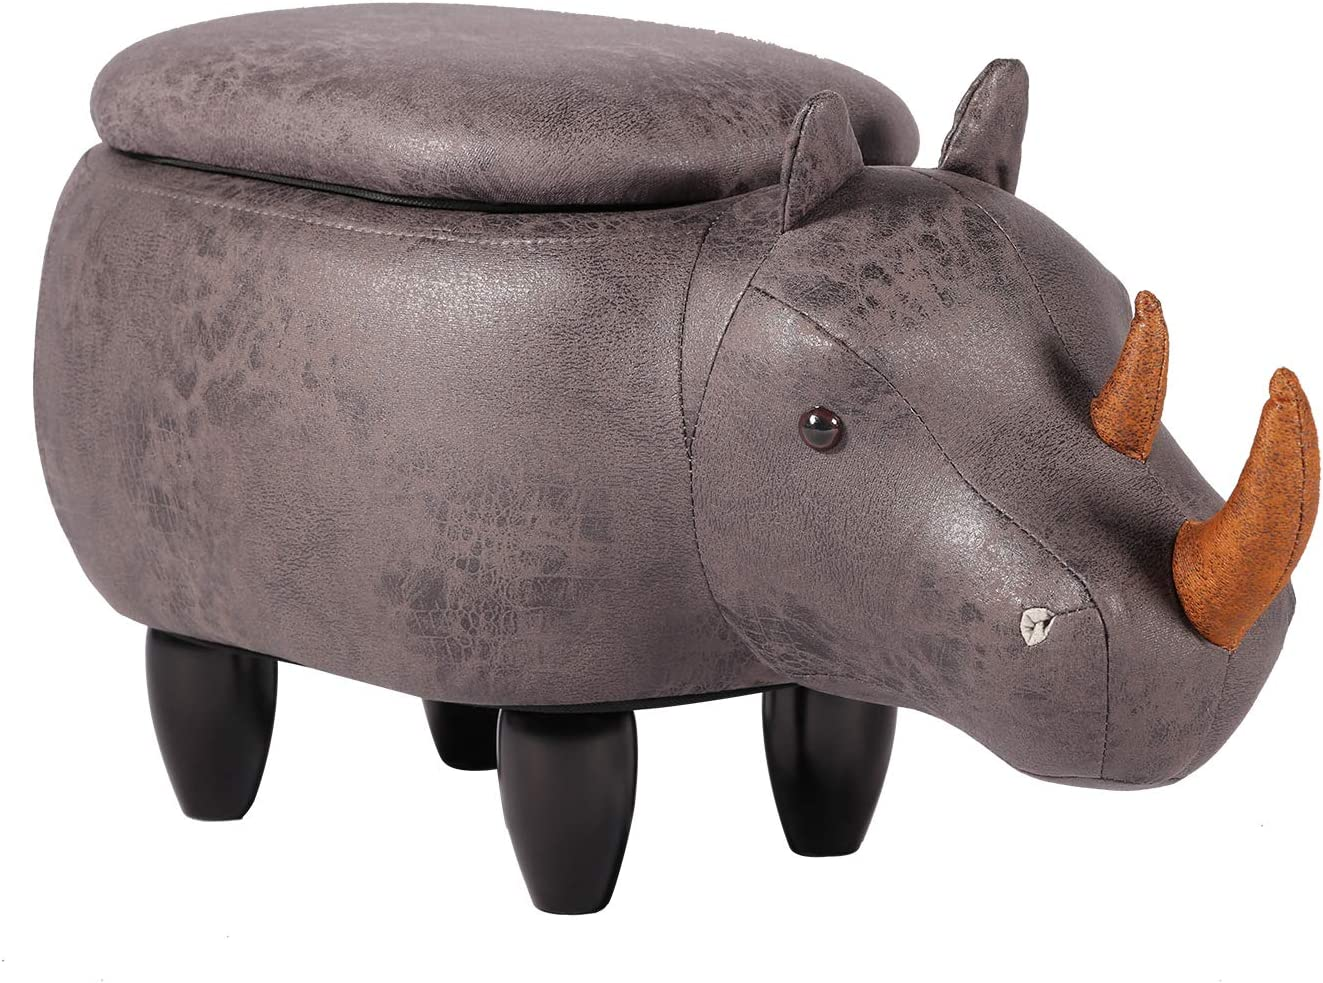 VECELO Decorative Storage Ottman Footrest Foot Stool for Bedroom, Playroom & Living Room (StyleA), Dark Grey